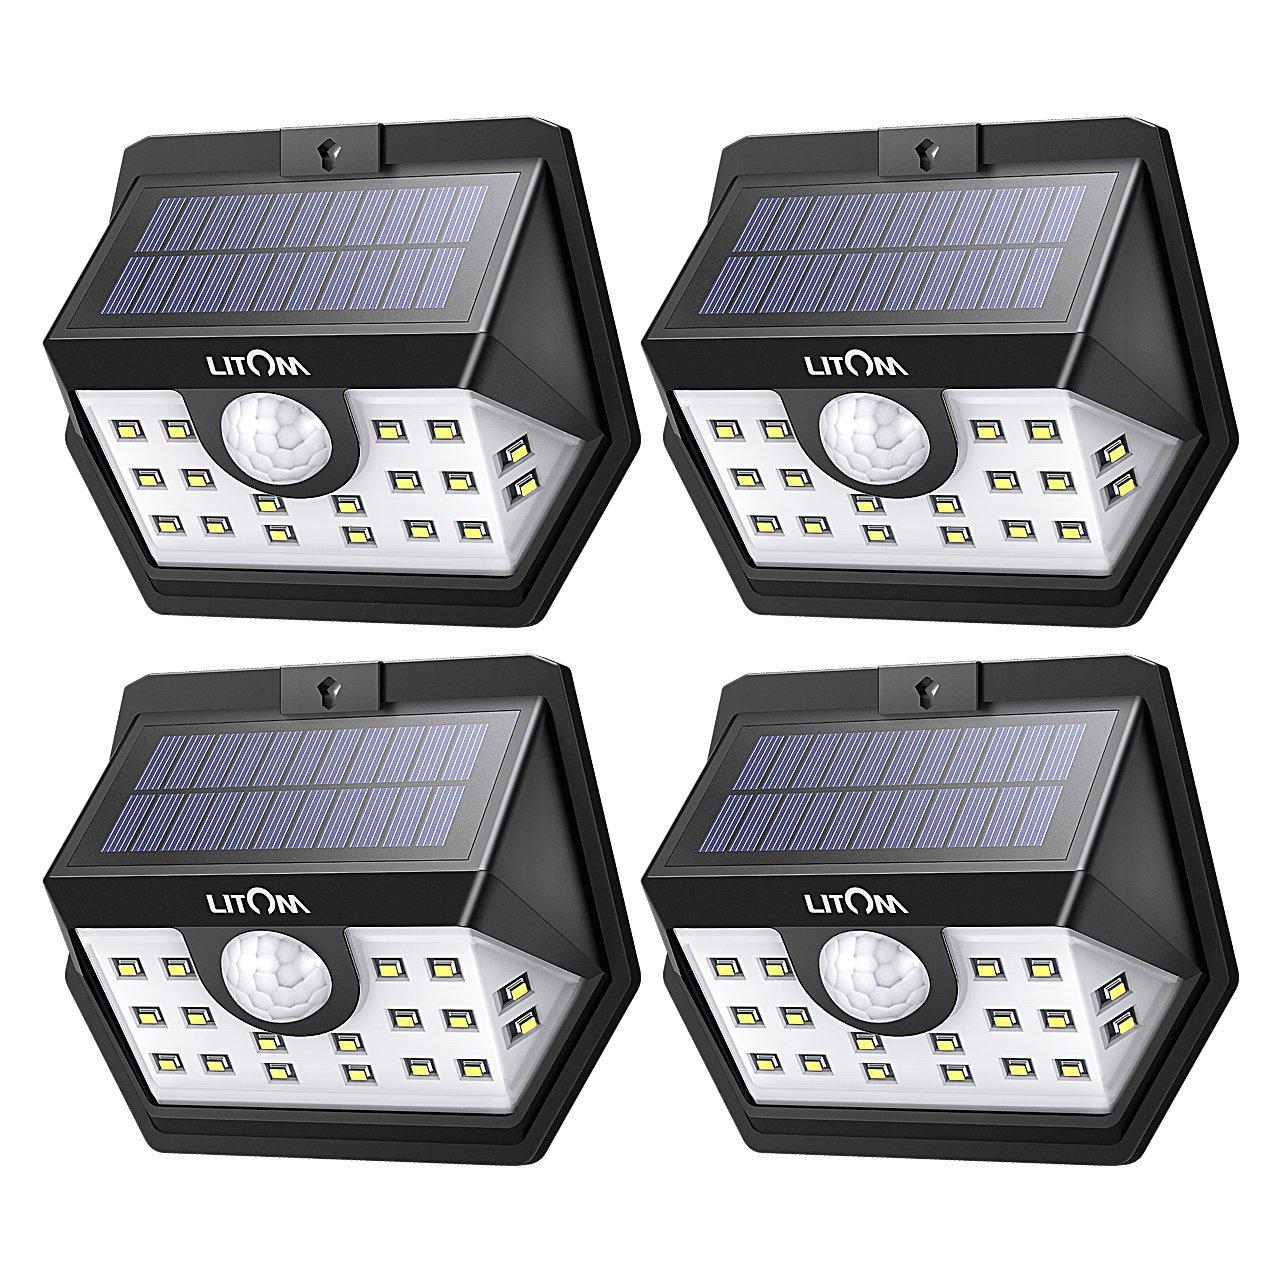 LITOM [Gen-3] Solar Lights Outdoor, 20 LED Wireless Wide Angle Motion Sensor Lights, Heavy Duty IP65 Waterproof Security Solar Light for Front Door, Yard, Garage, Deck, Porch, Shed, Walkway (4 Pack)